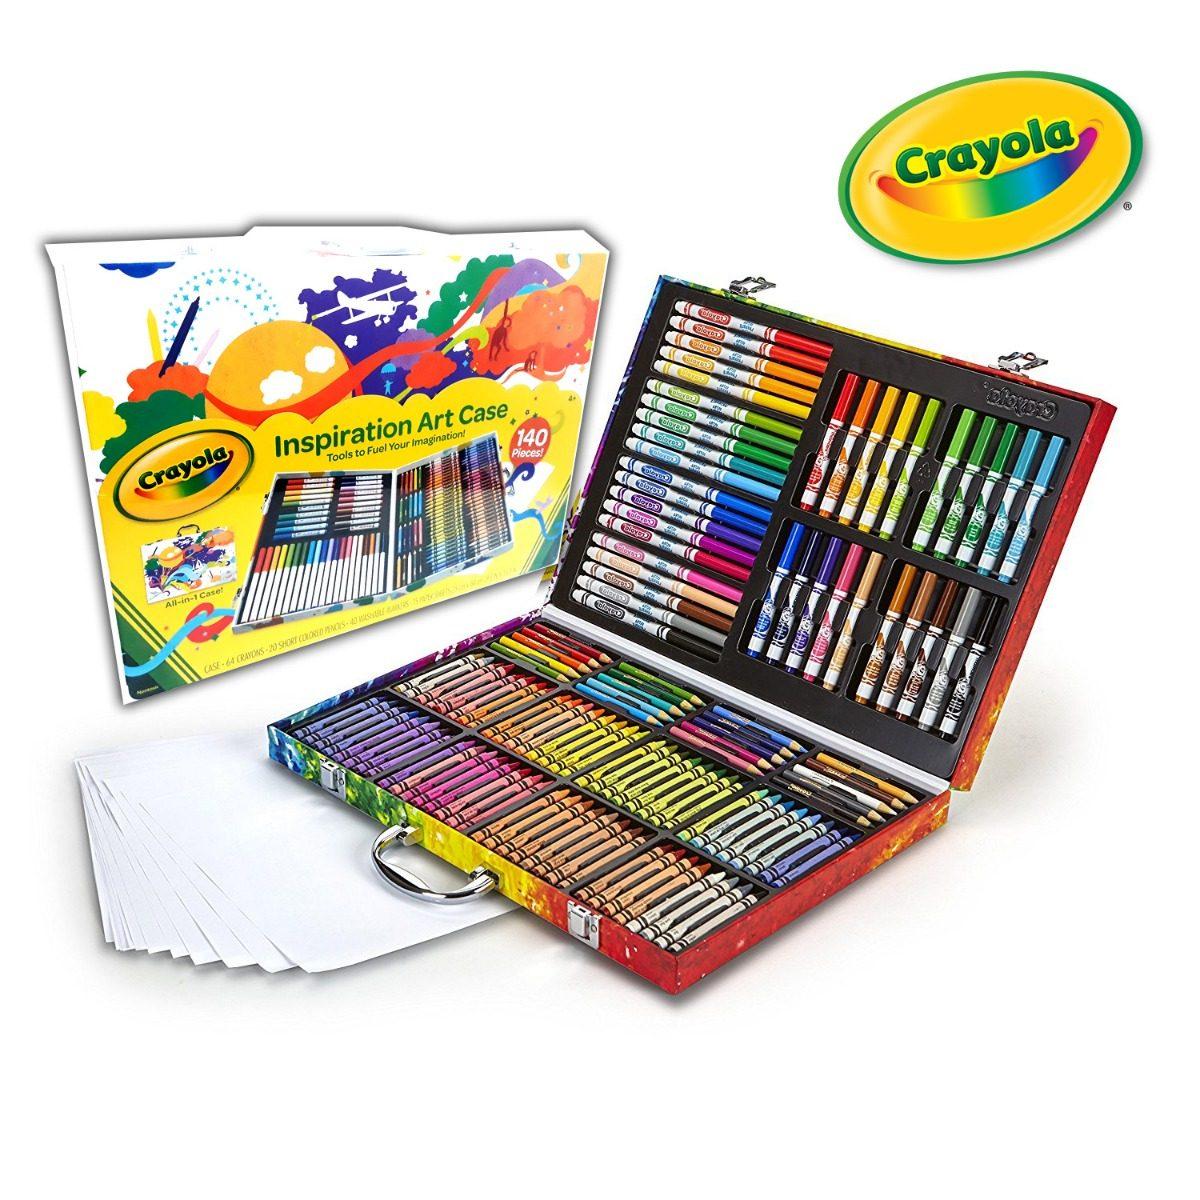 Crayola Maletin Inspiration Art Case Set 140 Pz Envio Gratis ...